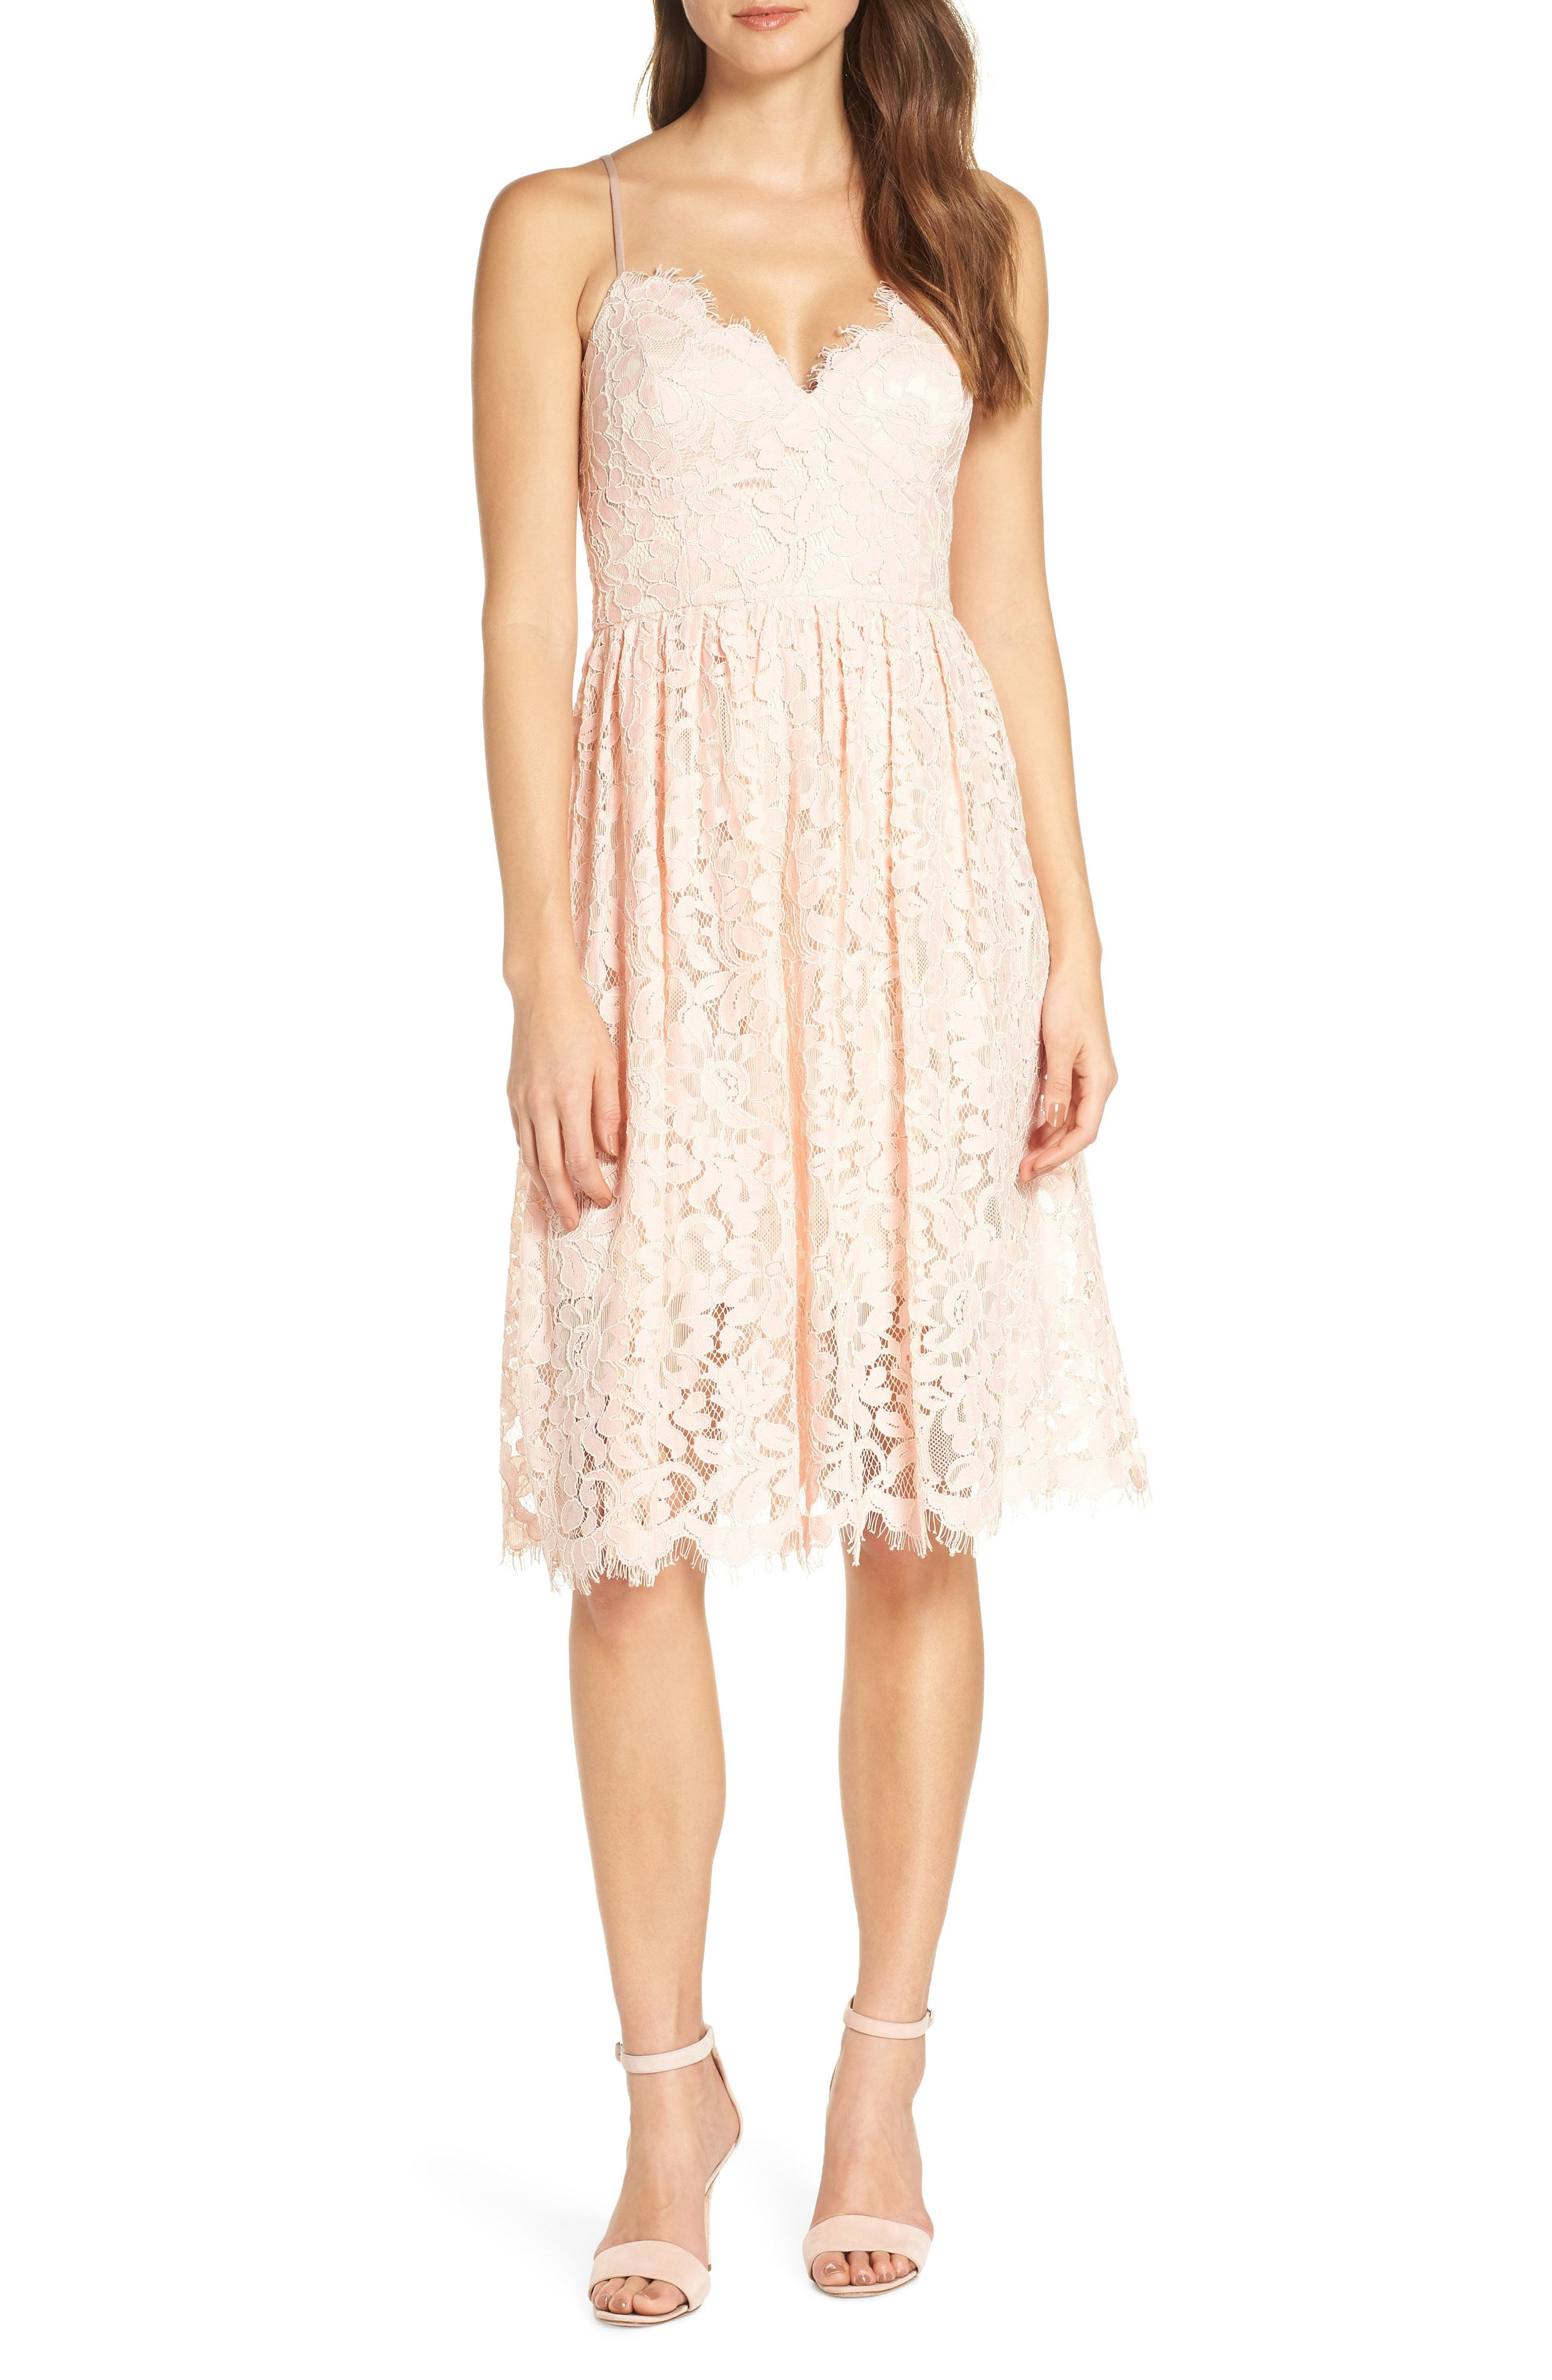 Flare Available AtnordstromRyLinds Dress Eliza J Lace Fitamp; wOPTXZkiu